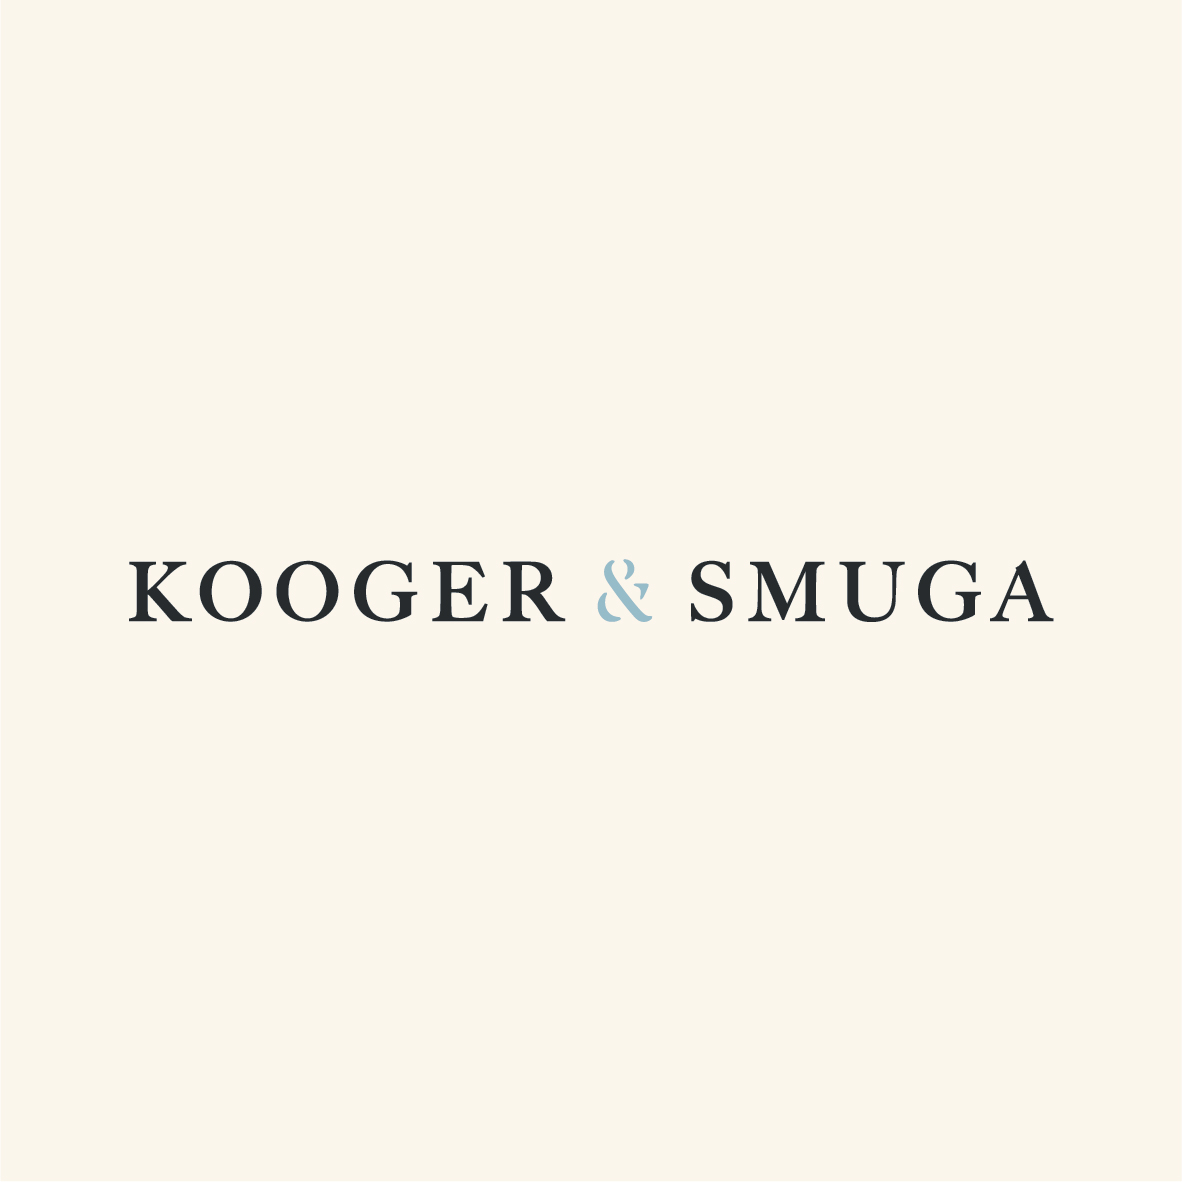 KS_logos-03.jpg